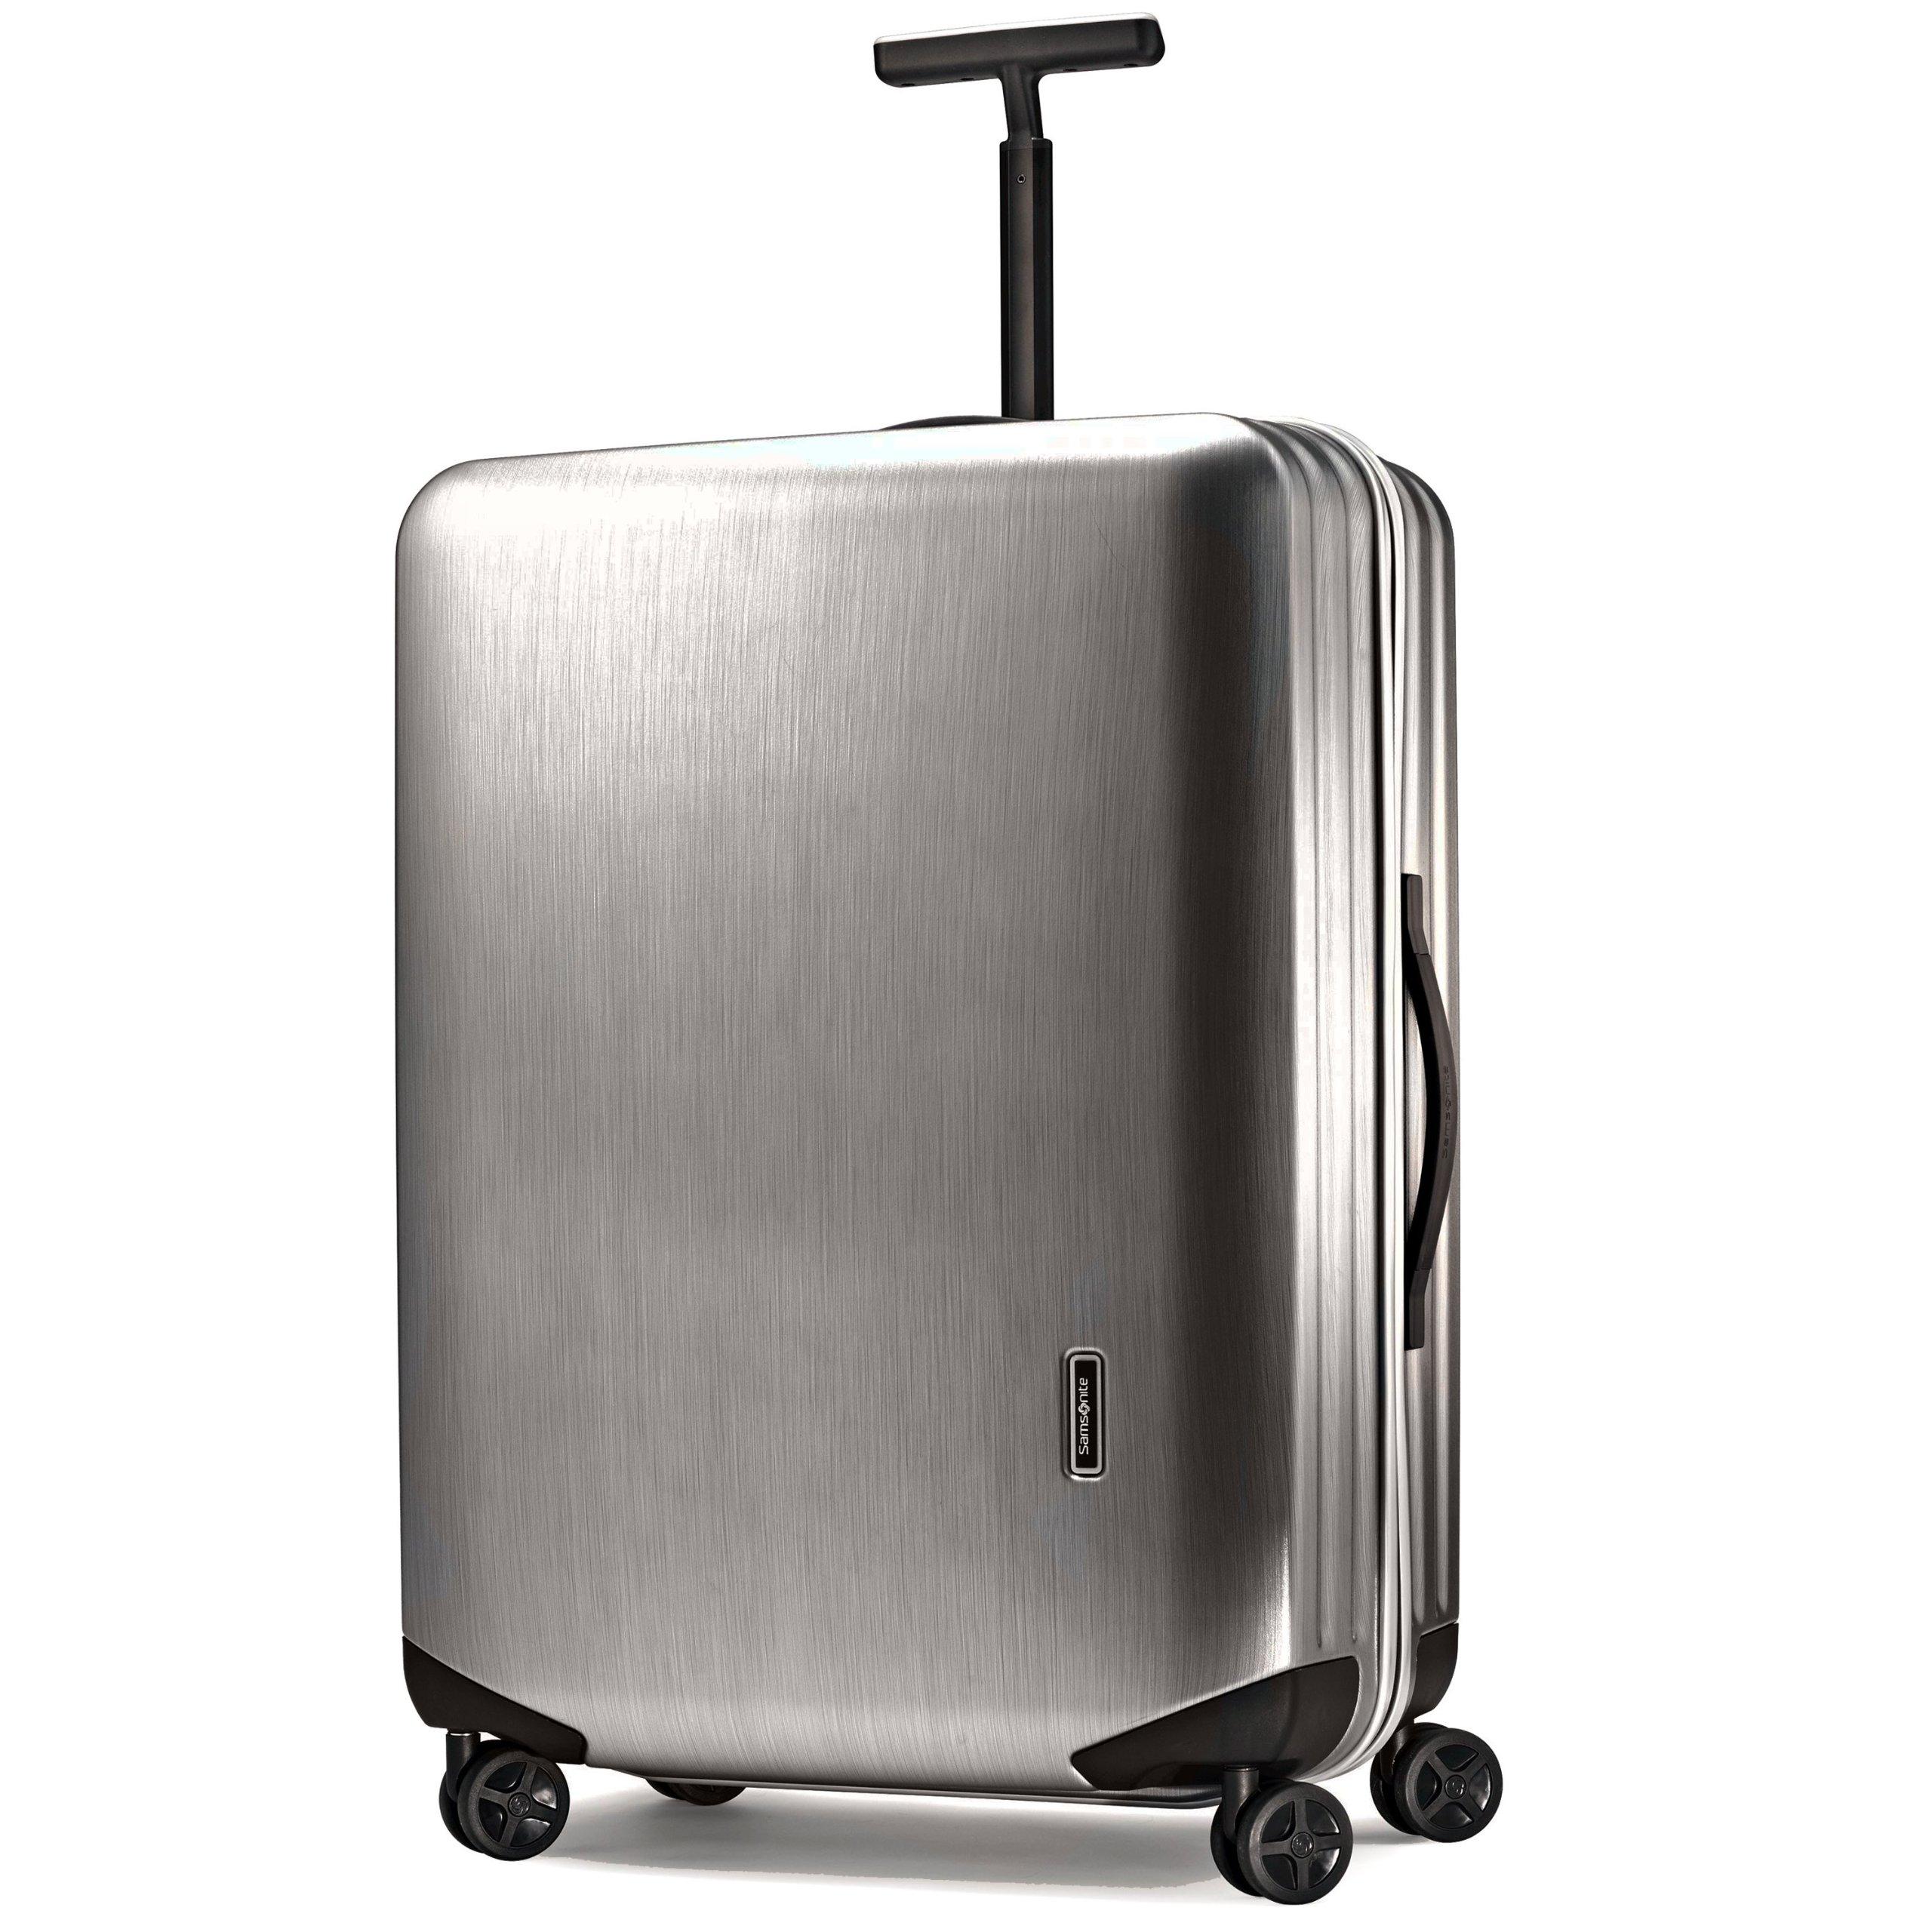 Samsonite Luggage Inova Spinner 30, Metallic Silver, One Size